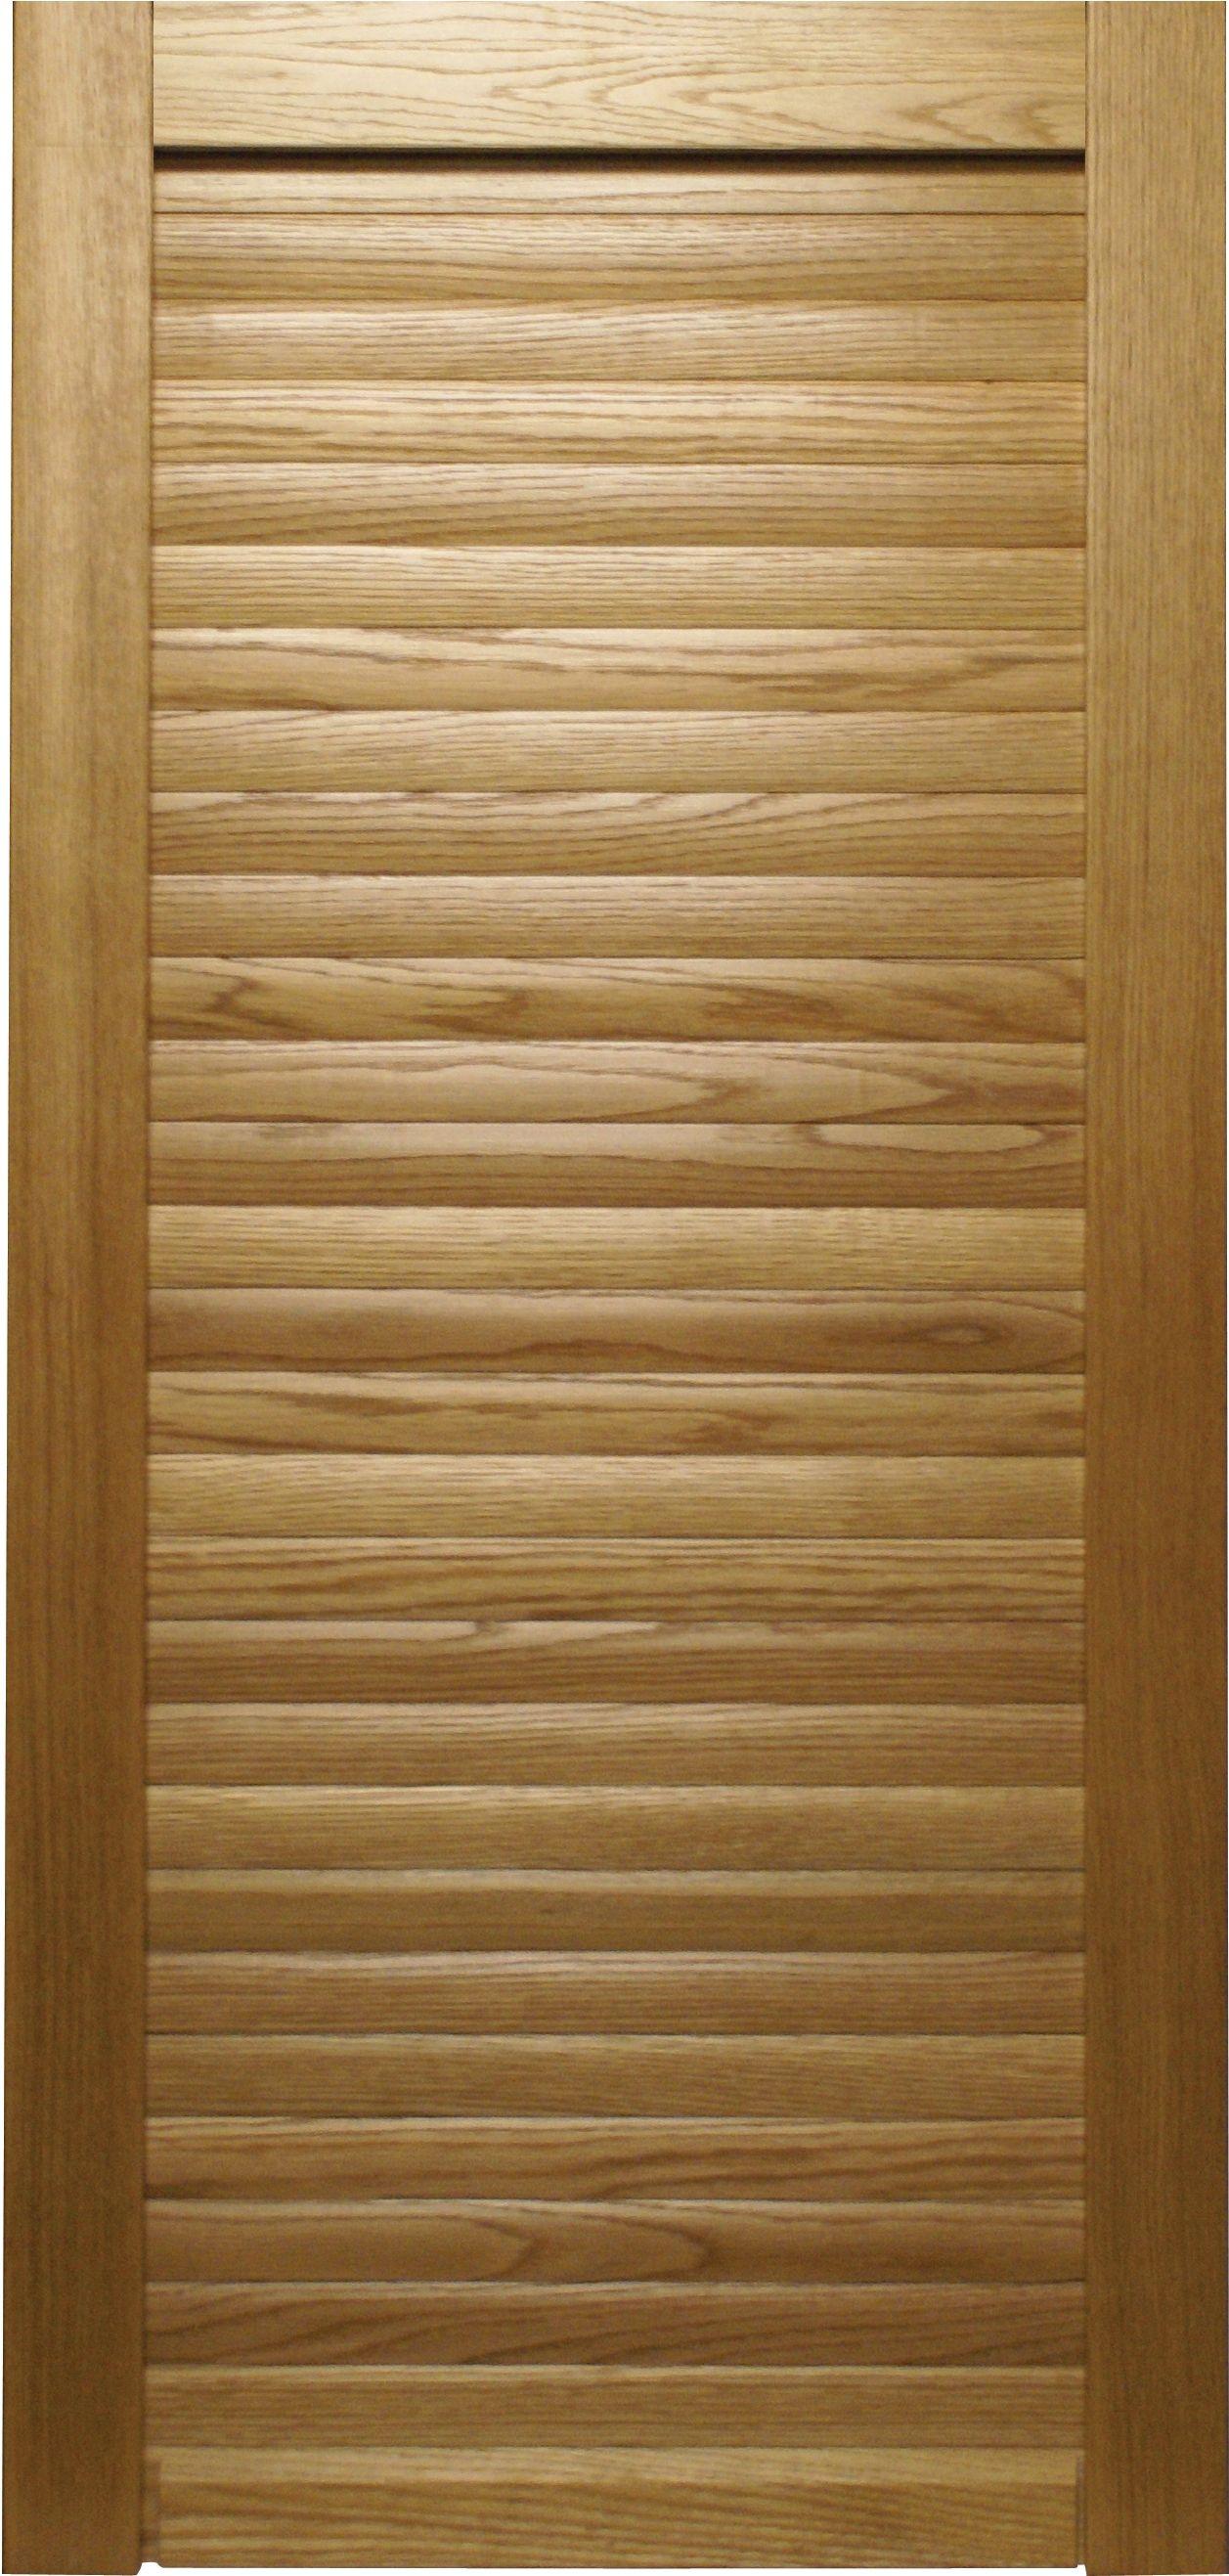 Wooden Roller Shutter Cabinet Doors